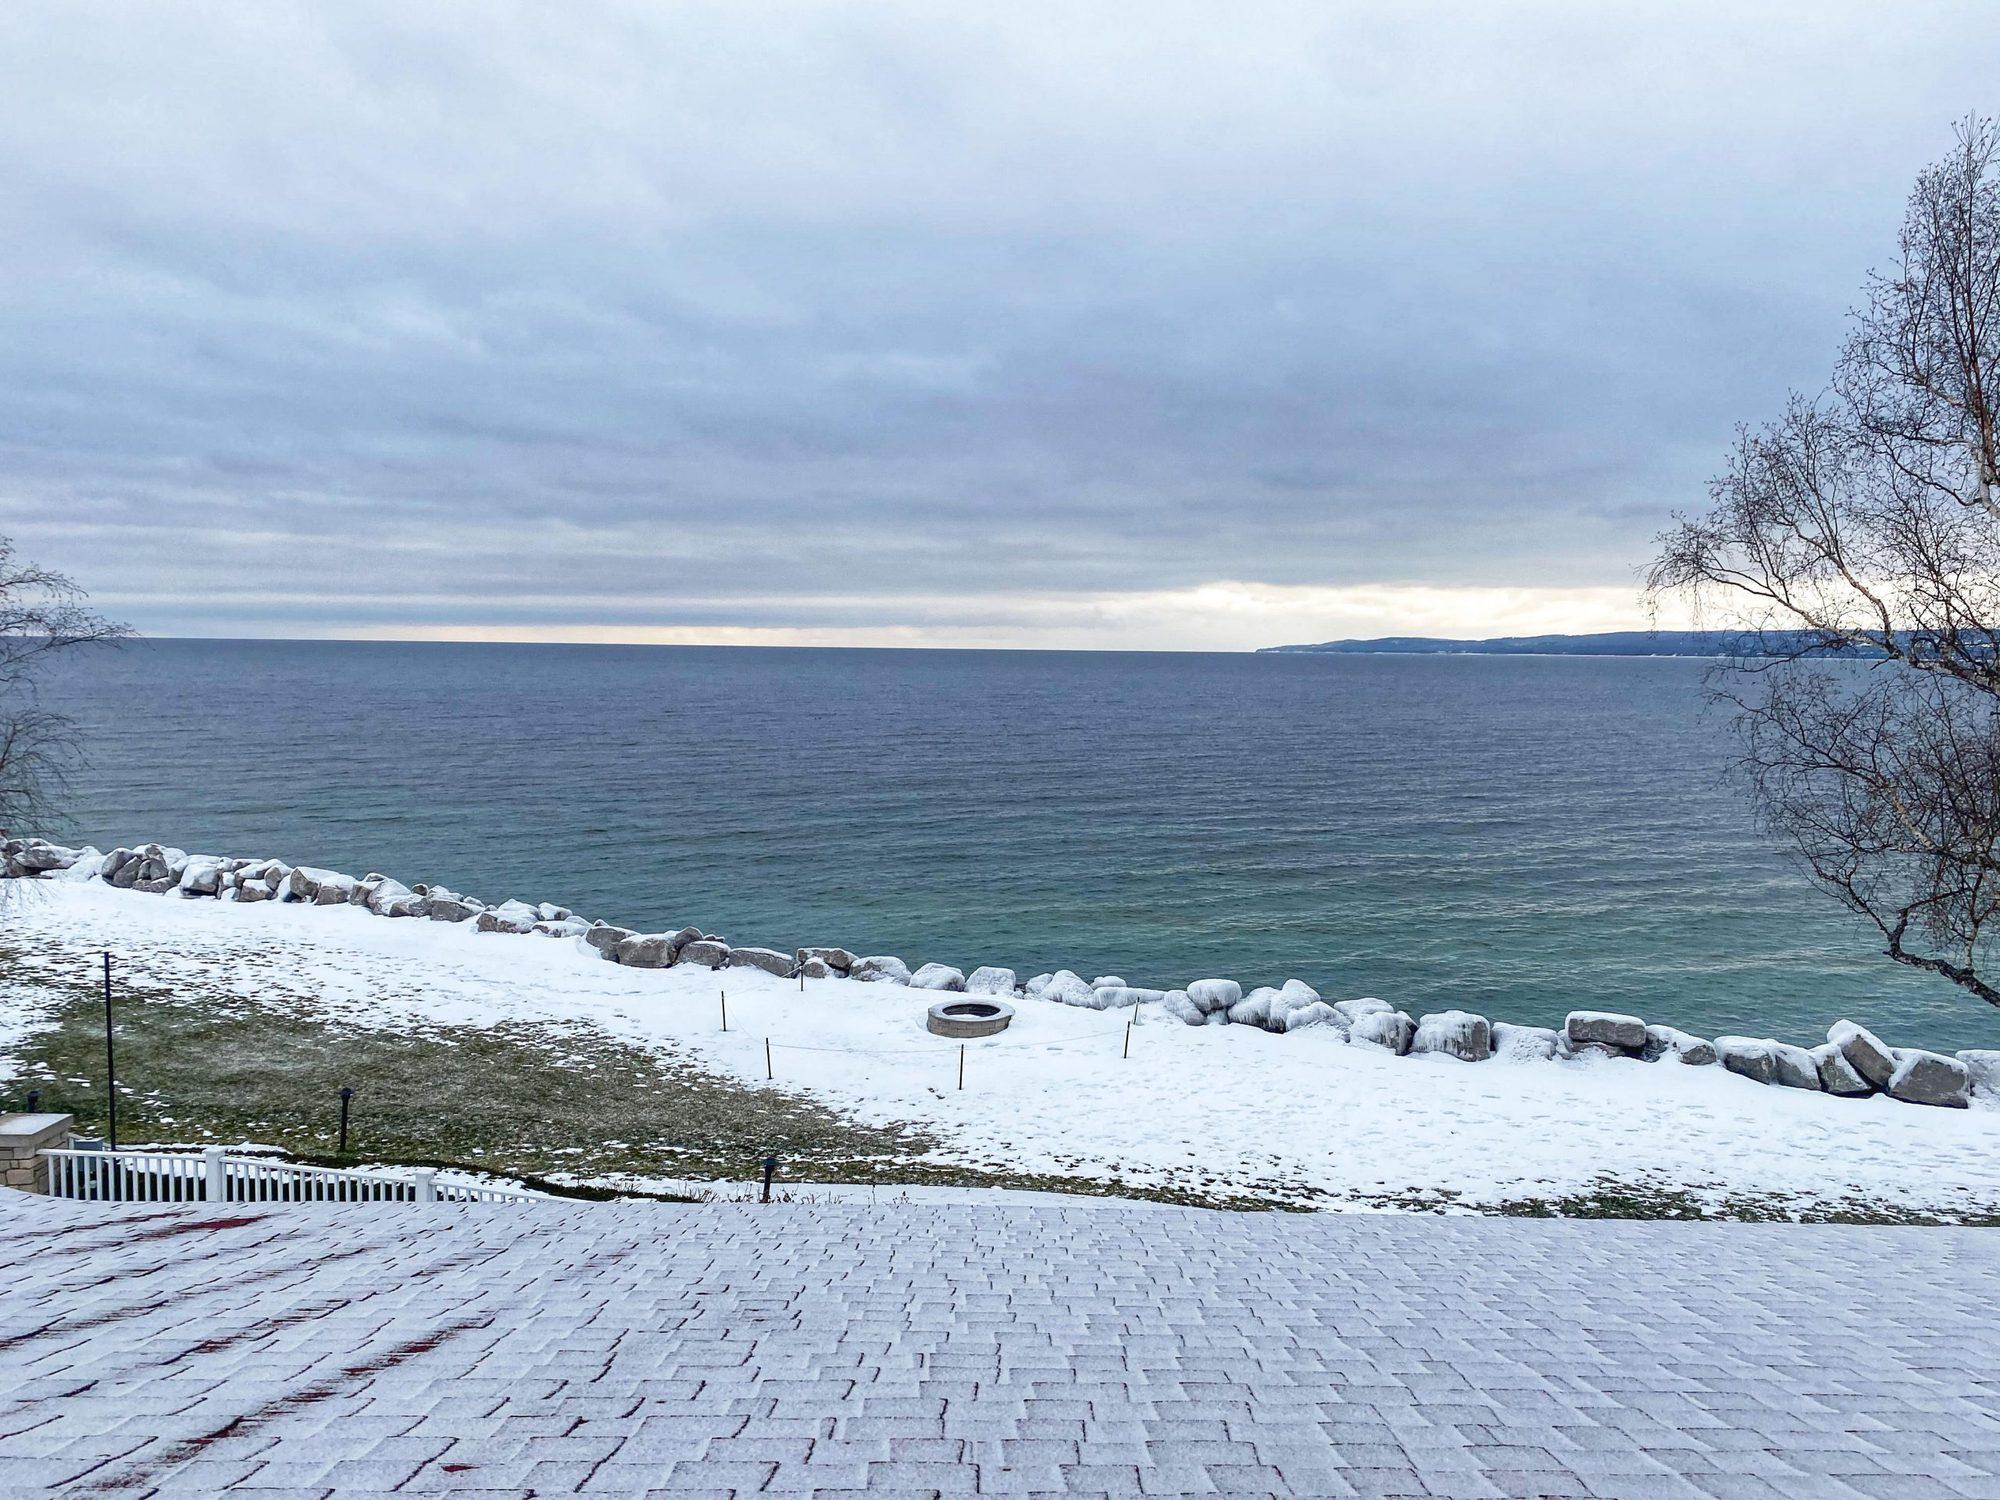 winter sunrise over lake michigan |Inn at Bay Harbor by popular Michigan travel blog, The House of Navy: image of Bay Harbor in Michigan.